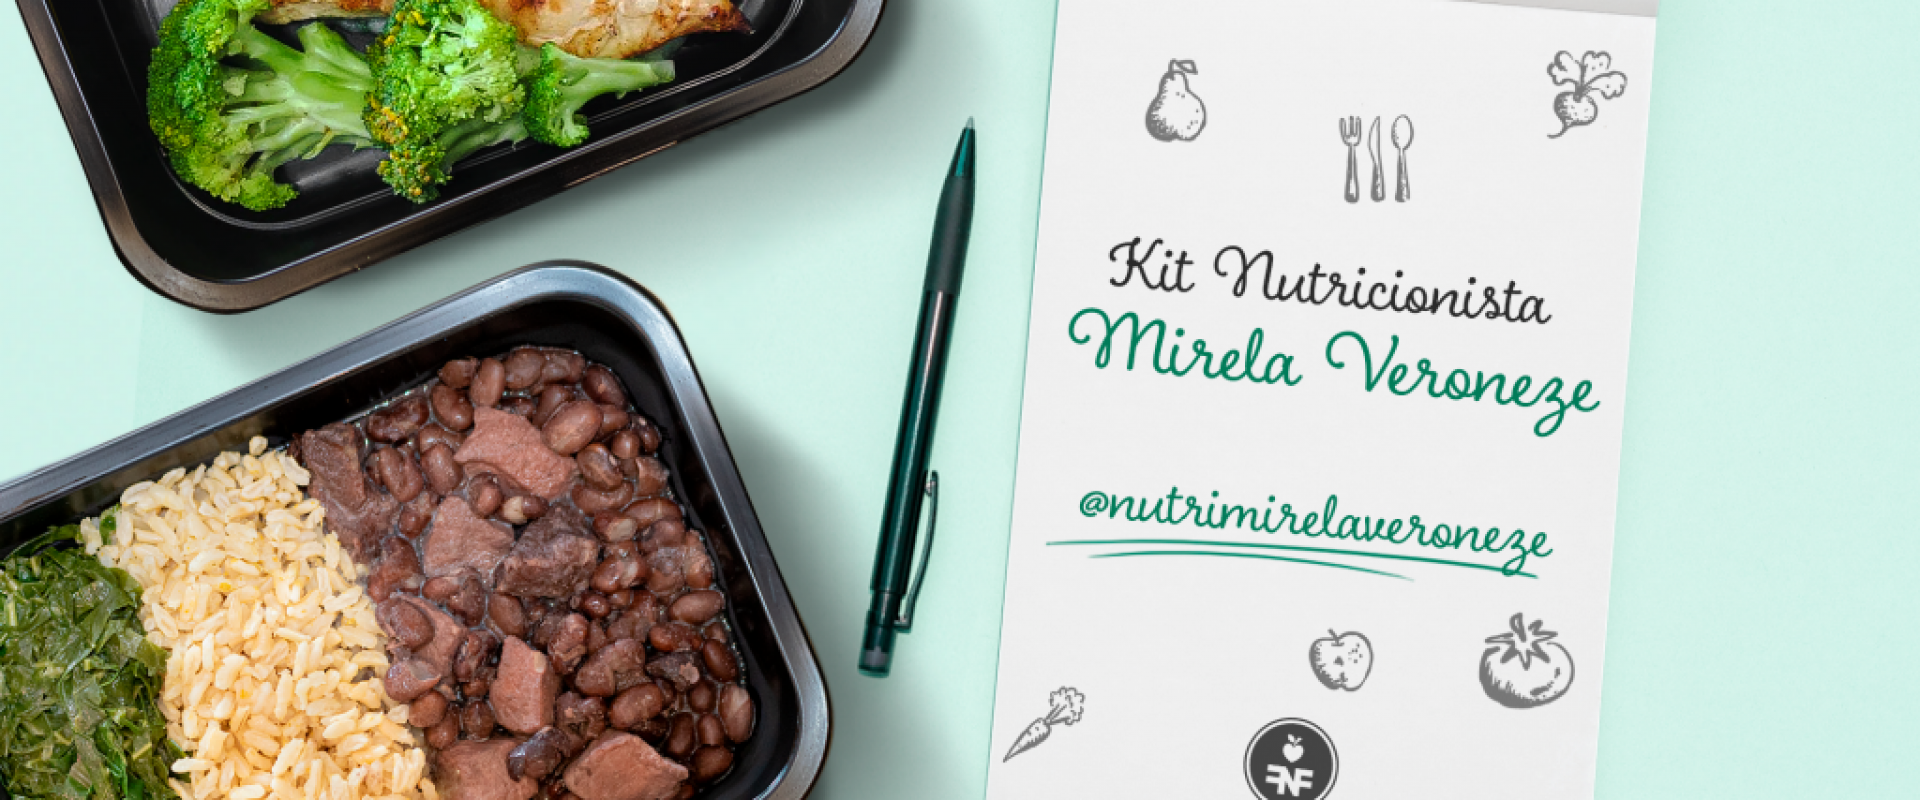 Novidade: kit Nutricionista Mirela Veroneze